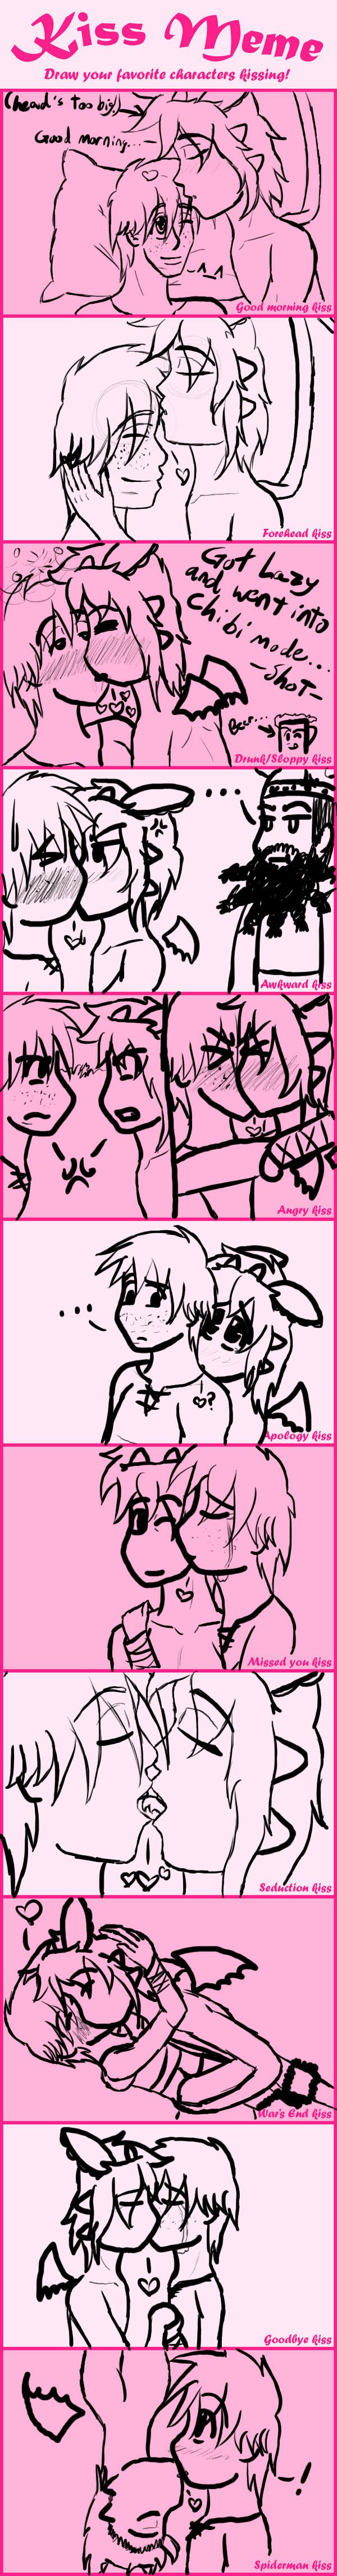 My Top 14 Favorite Kiss Scenes Meme by StellarFairy on ...  |Midnight Kiss Meme